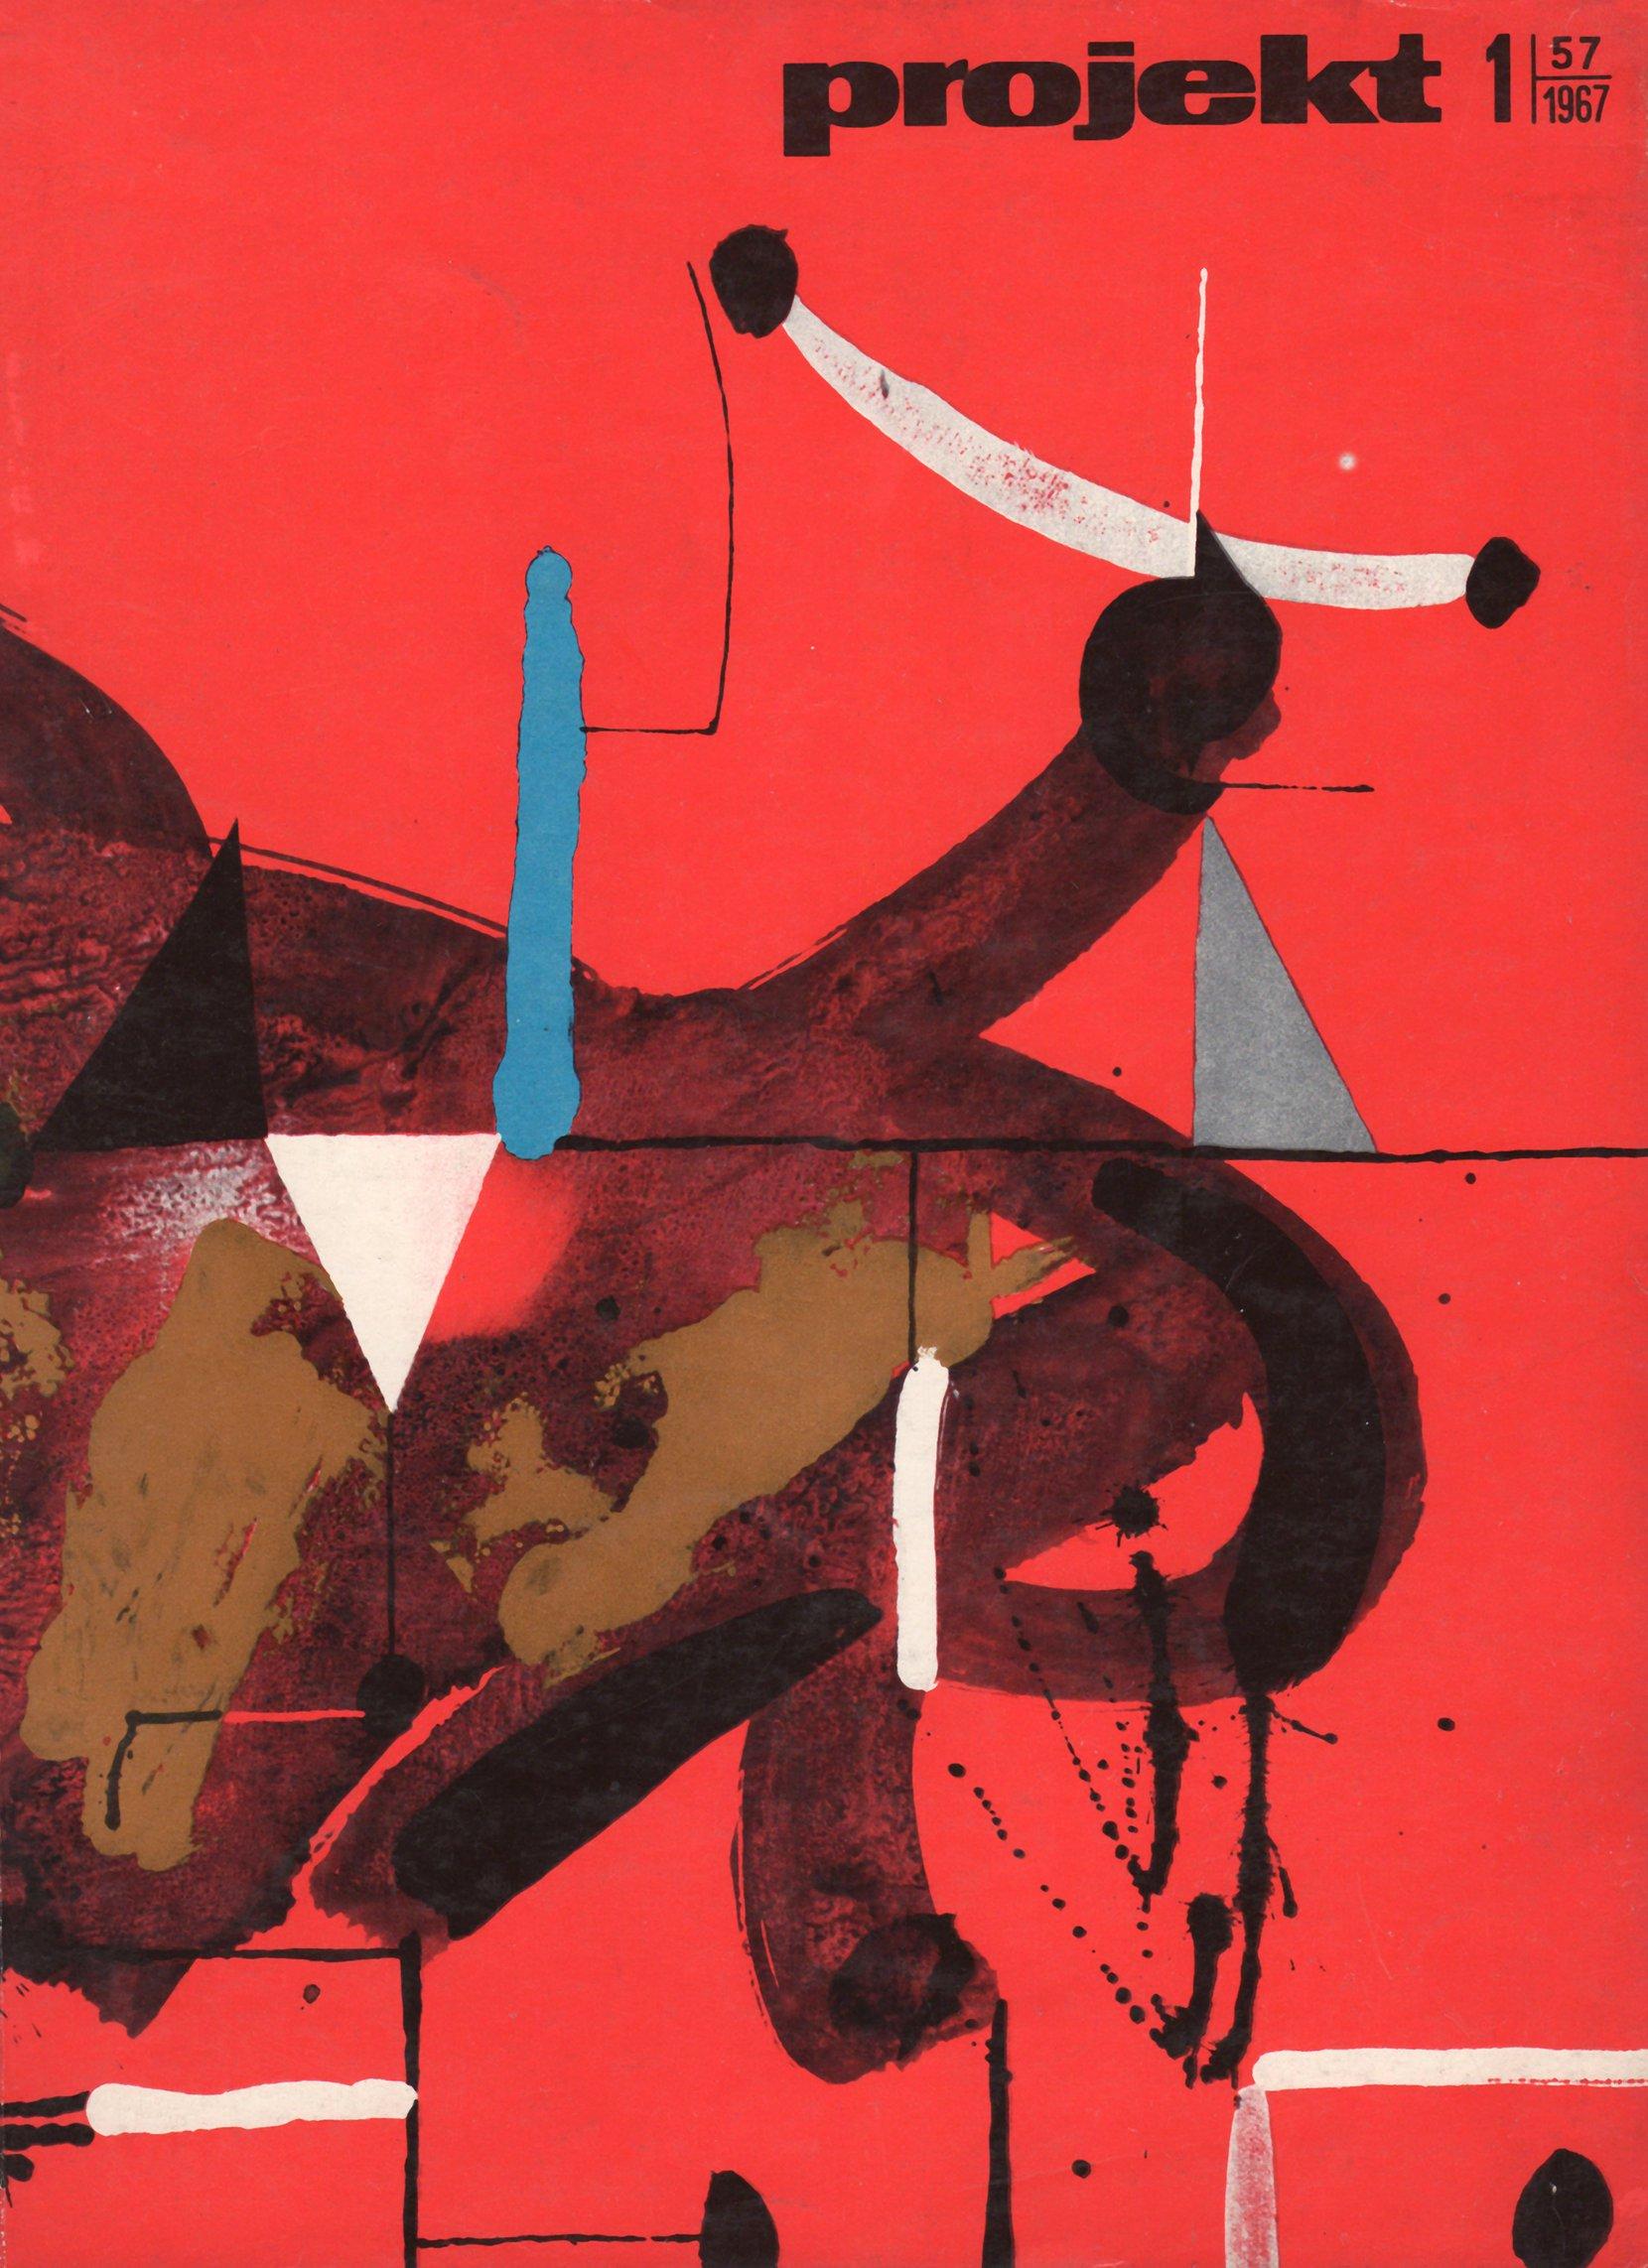 """projekt"" magazine, 1967-1 periodicals art & culture"